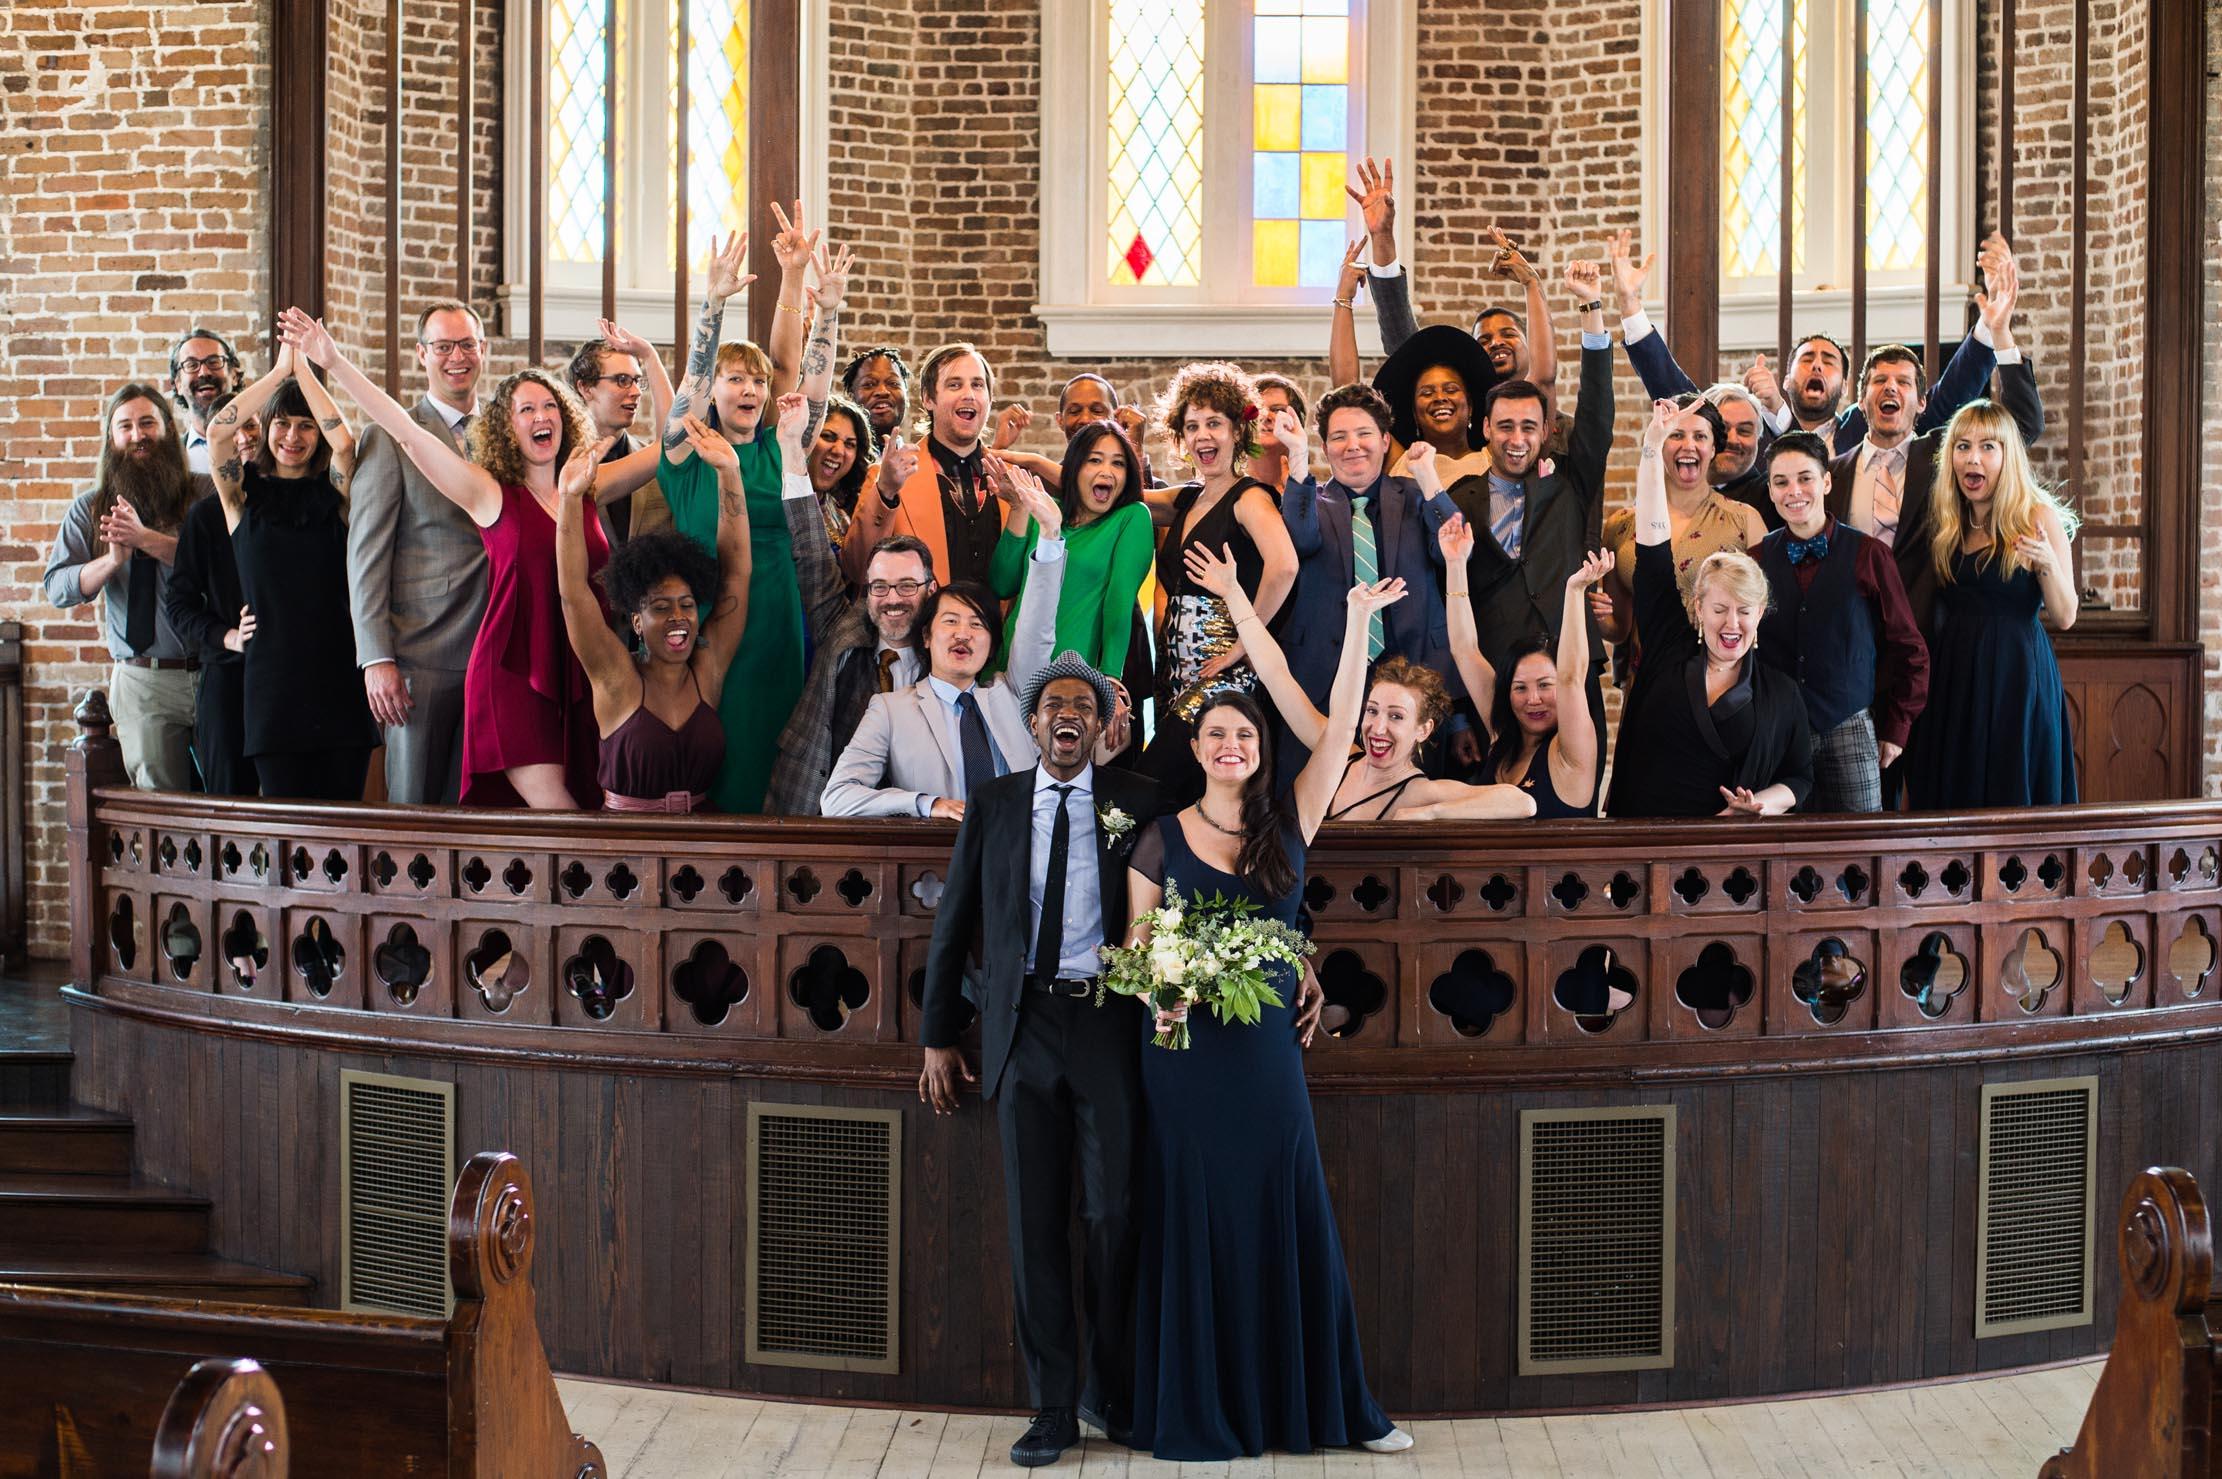 NOLA-Felicity-Church-Ace-Hotel-Wedding-1048.jpg